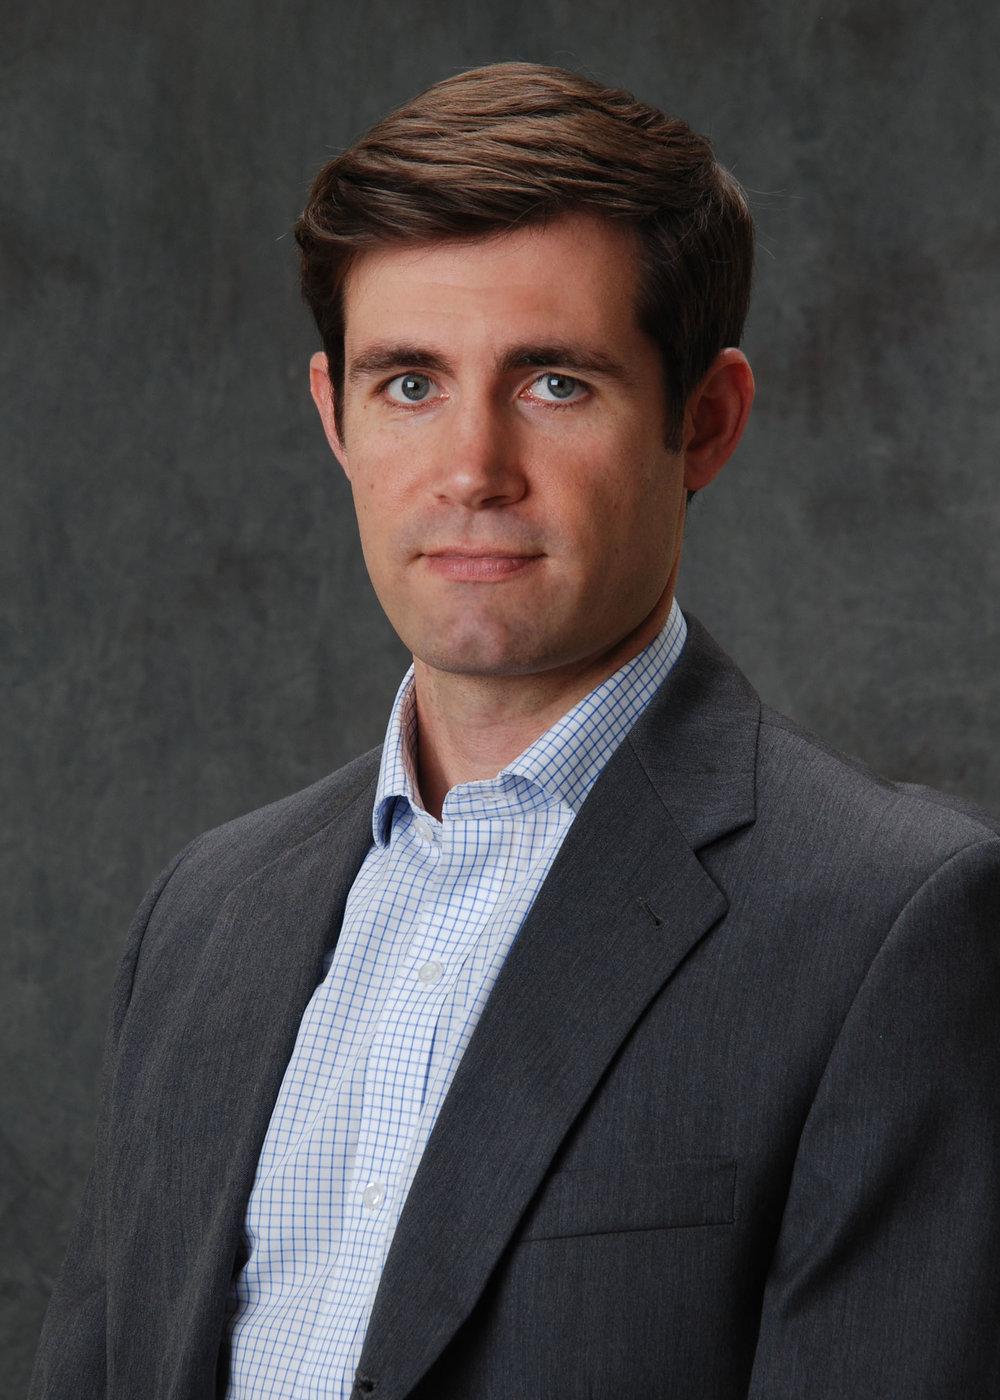 PETER MCGUIRE     Mountain View, CA   •Google Finance manager  •The Wharton School  •Vanderbilt University  •Former US Navy EOD